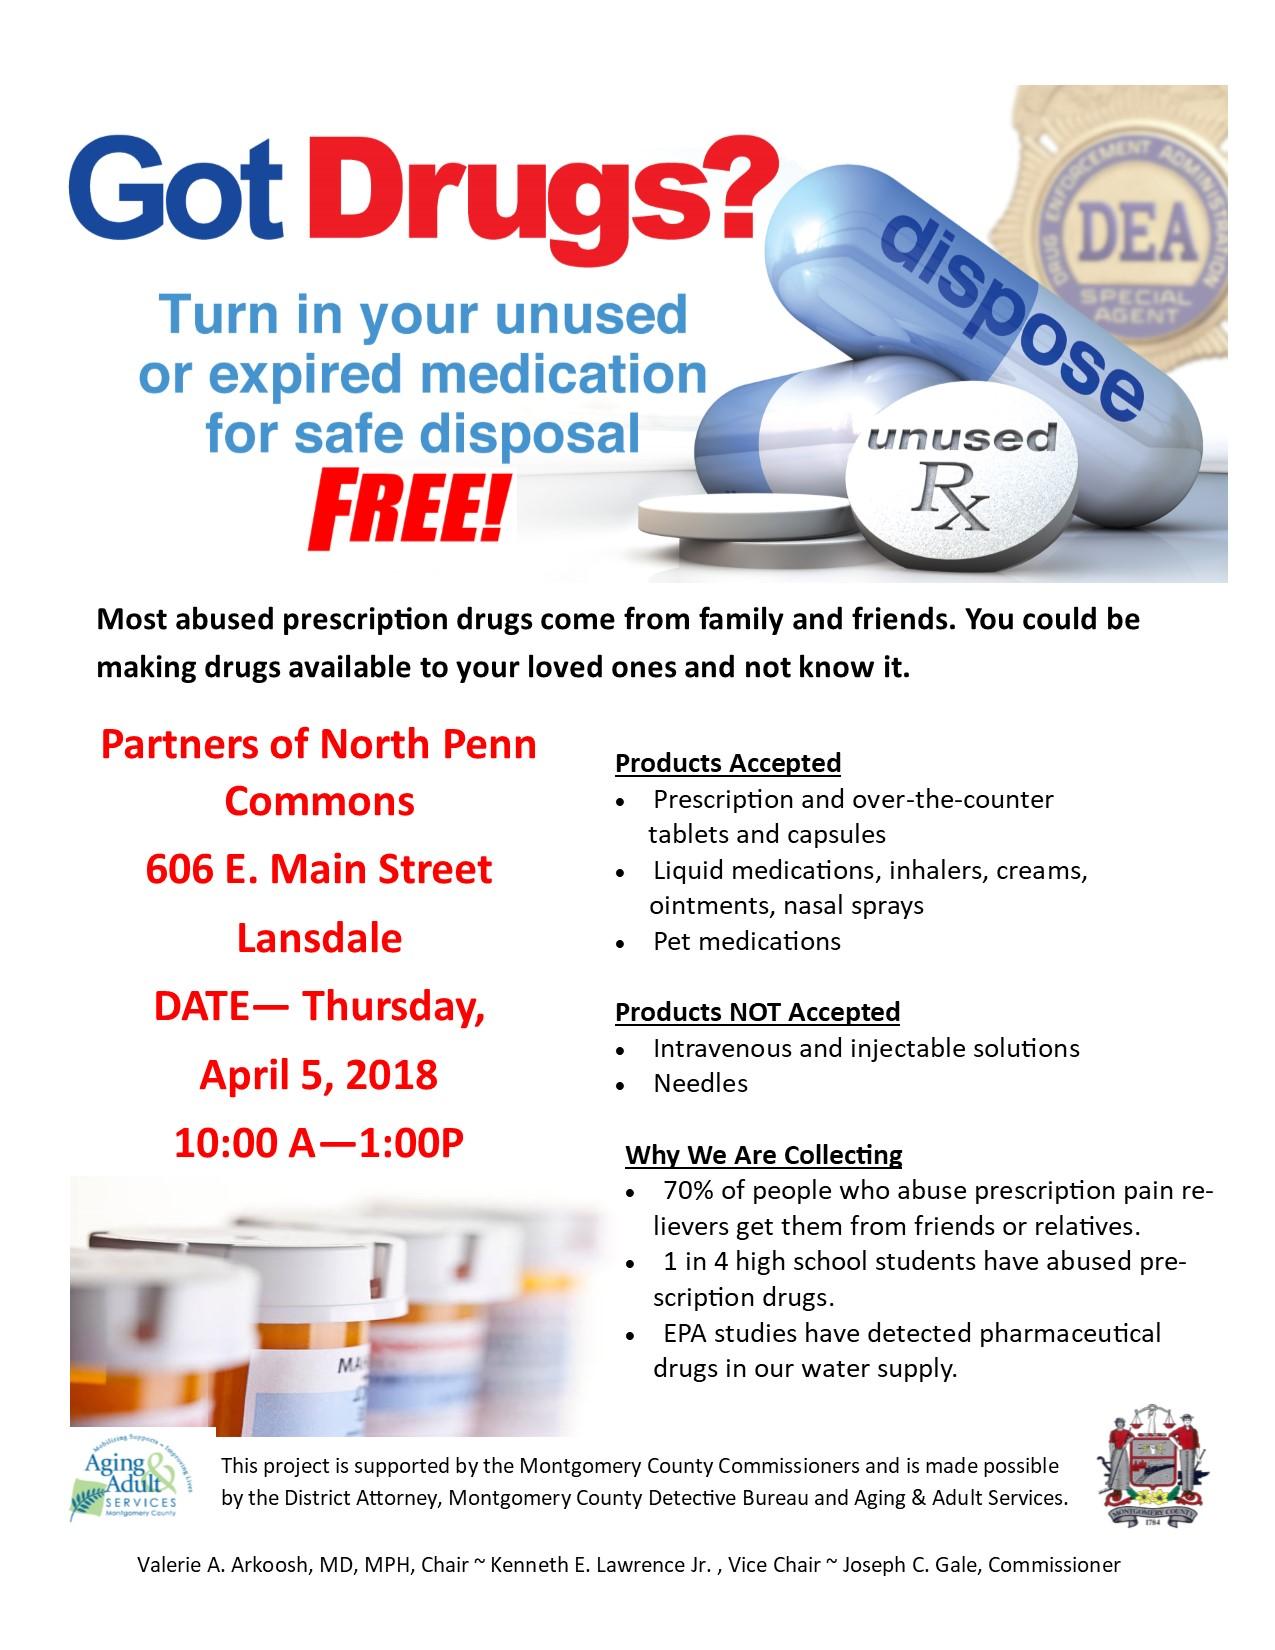 Drug Take Back Flyer Peak(2) (1).jpg